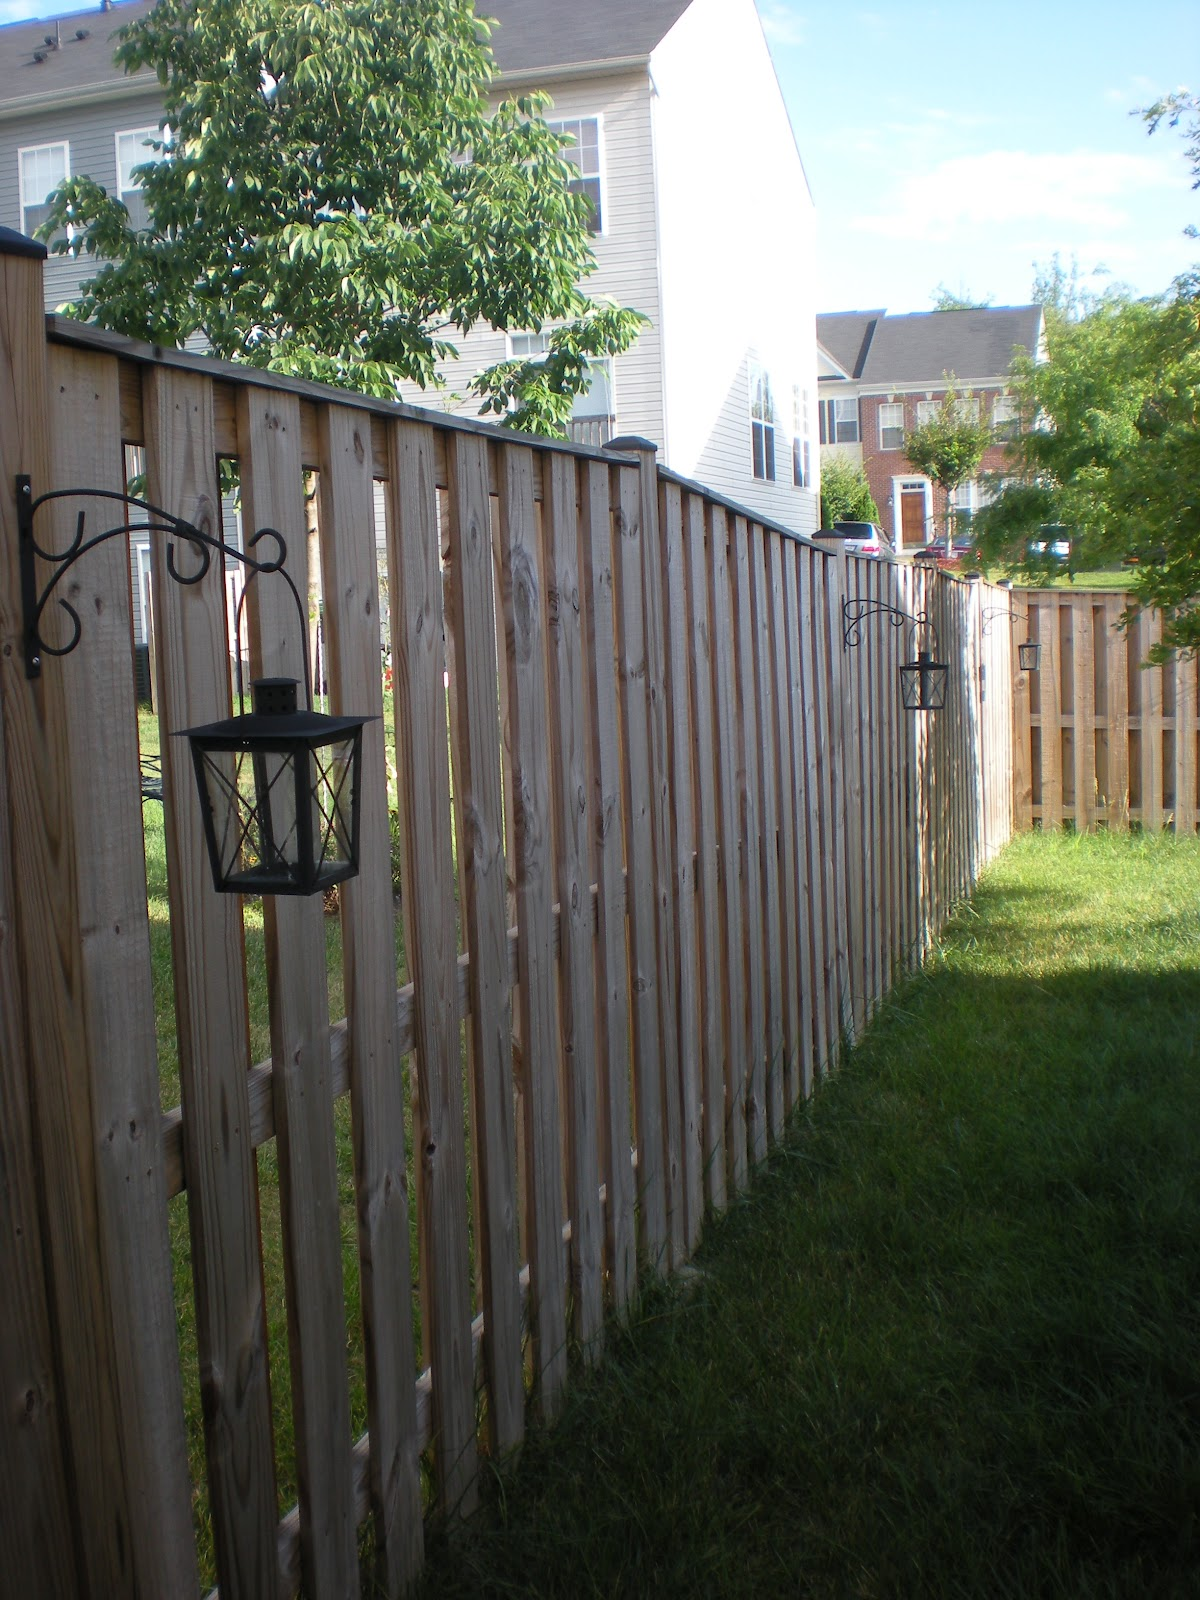 Backyard Lights Along Fence He lined the fence with